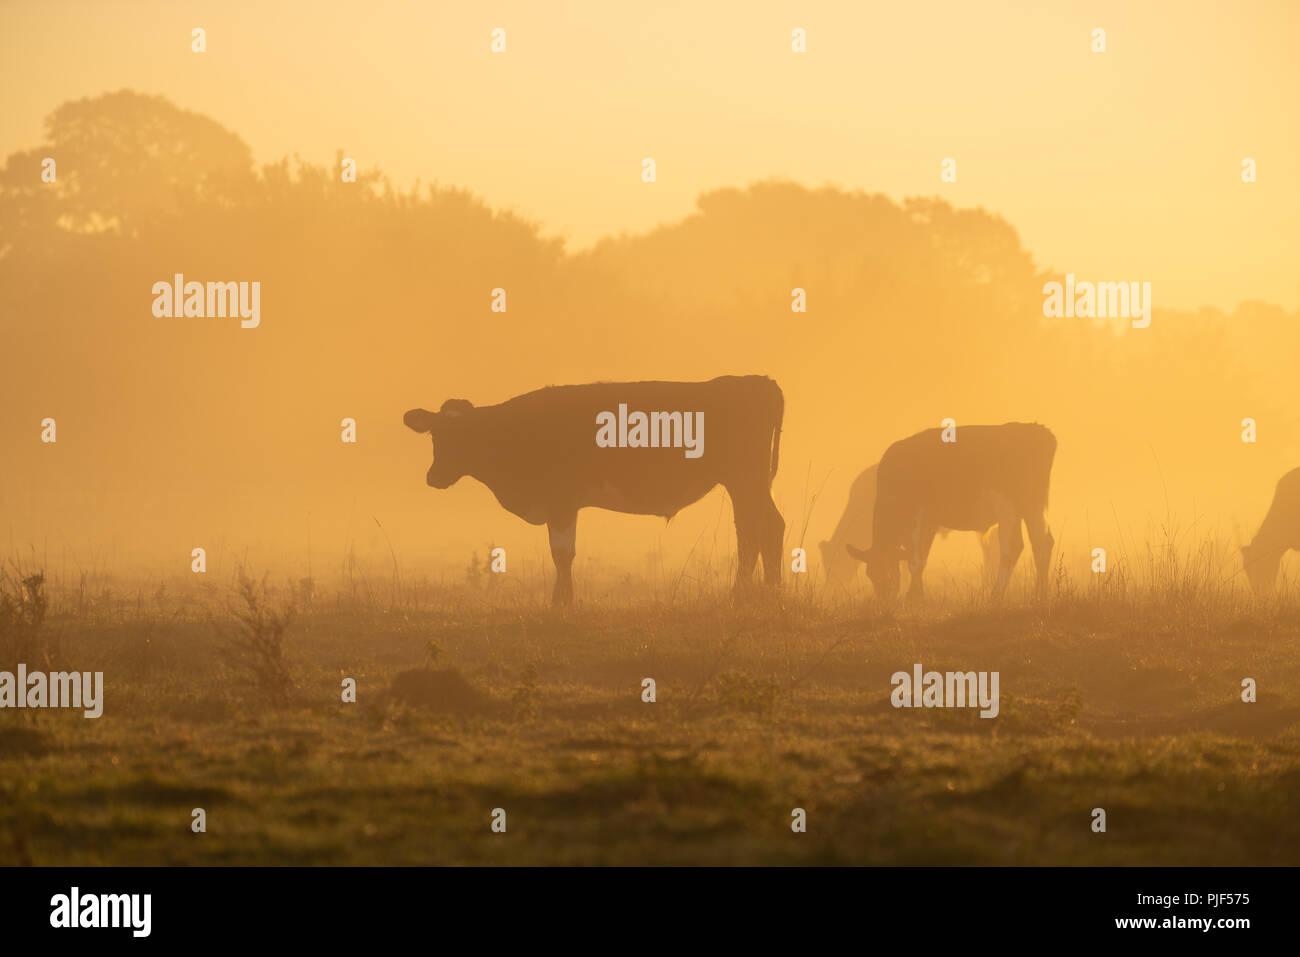 River Stour, Wimborne Minster, Dorset, UK. 7th Sept, 2018. UK Weather. Cows grazing on a misty crisp early autumnal sunrise along the river Stour near Wimborne Minster in Dorset. Credit: DTNews/Alamy Live - Stock Image